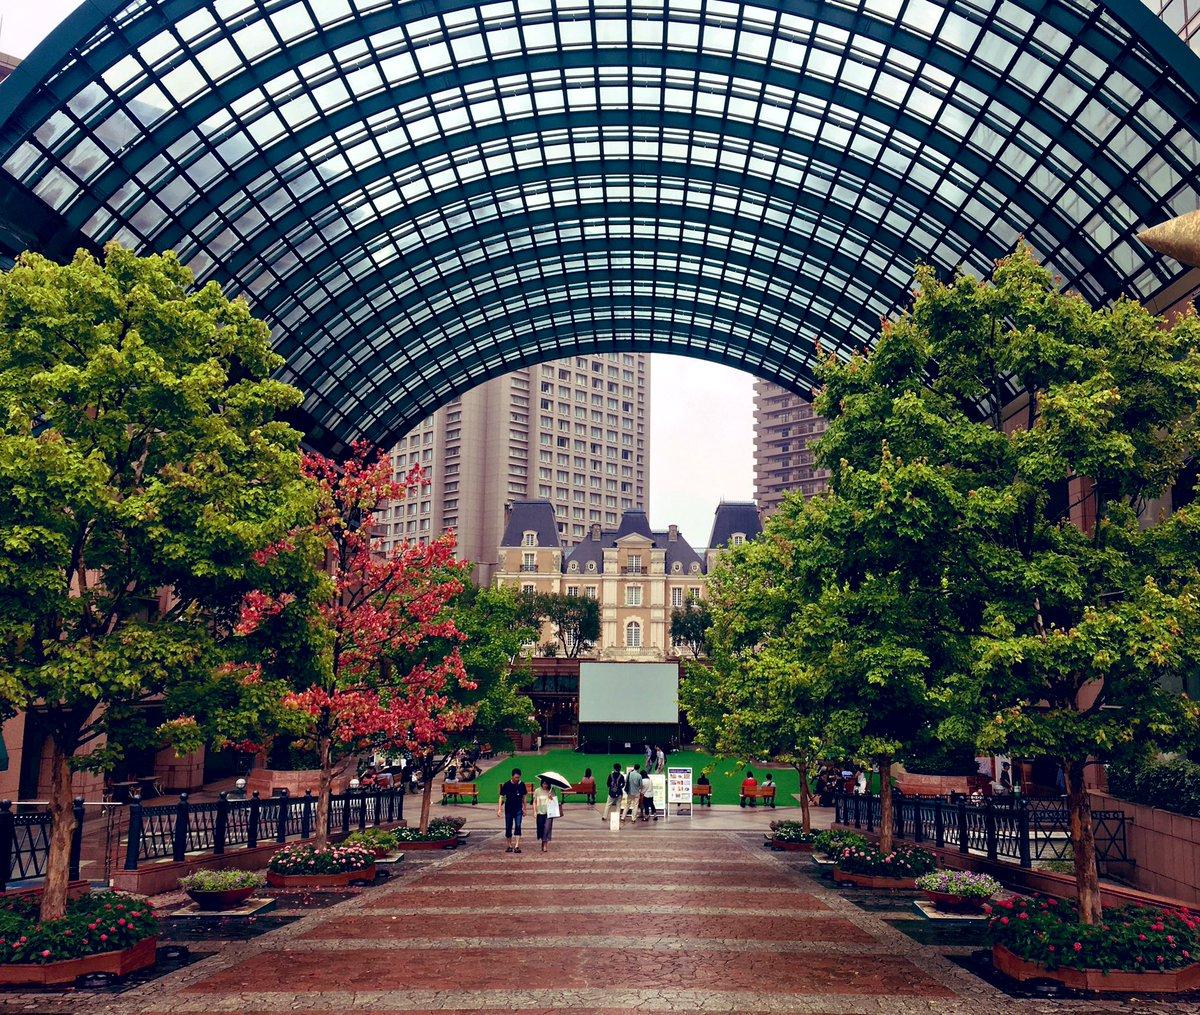 That summertime #japan #tokyo #streets pic.twitter.com/QmTkQQcXRI